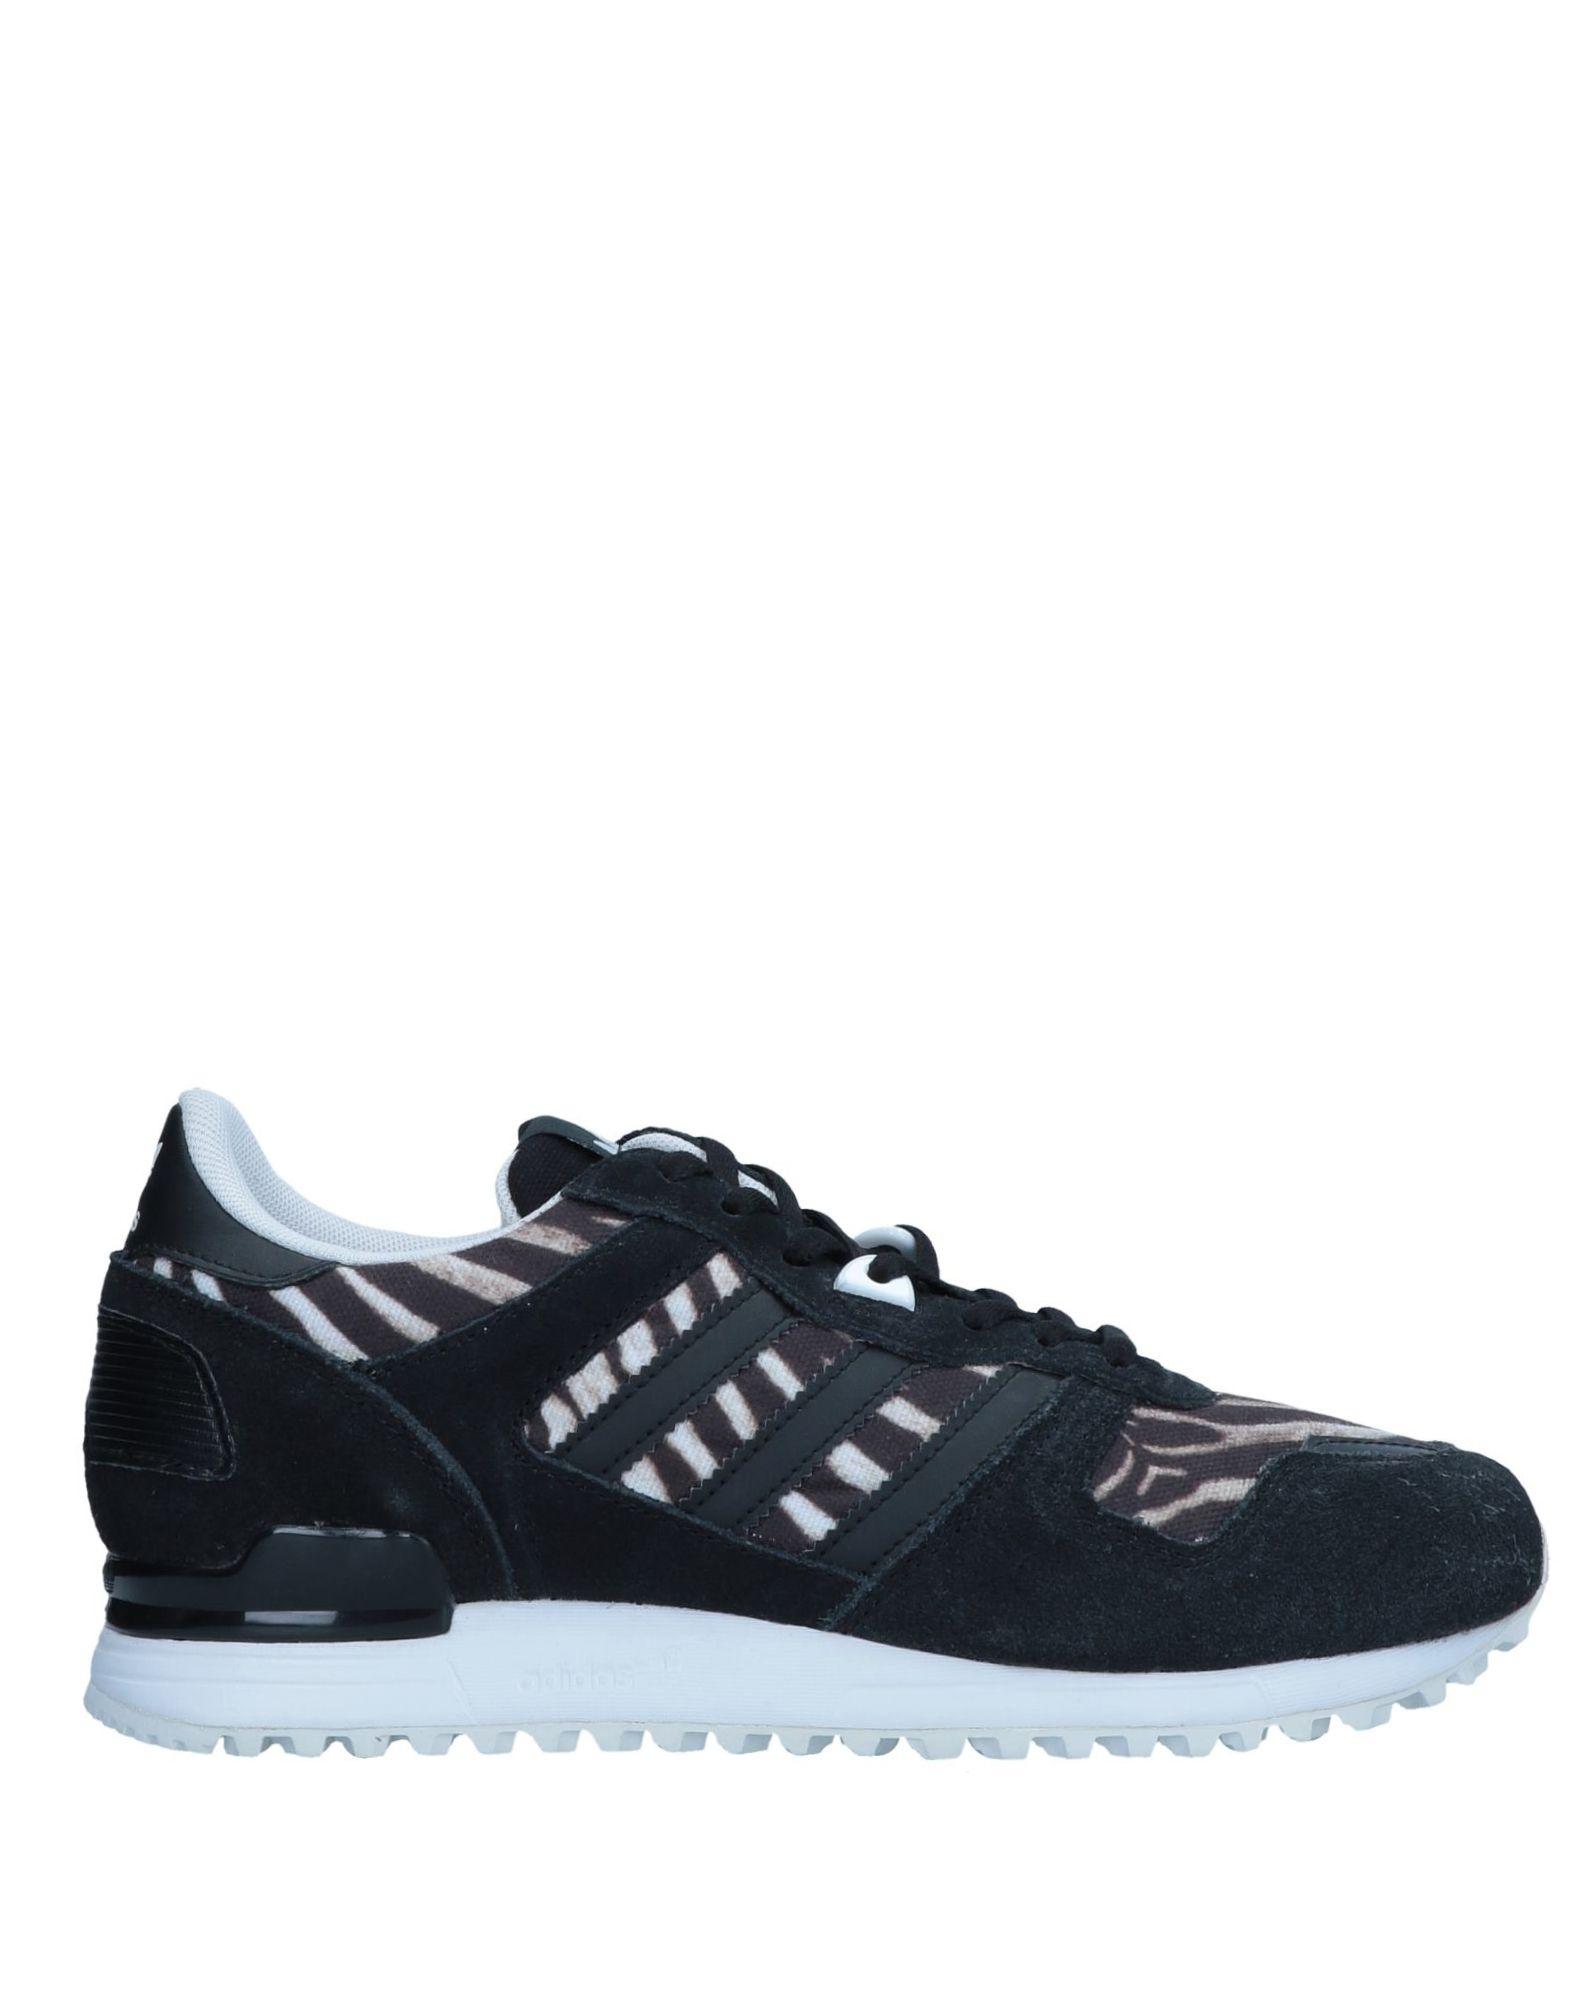 Adidas Originals Sneakers - Women Adidas  Originals Sneakers online on  Adidas United Kingdom - 11549400IX bdc343